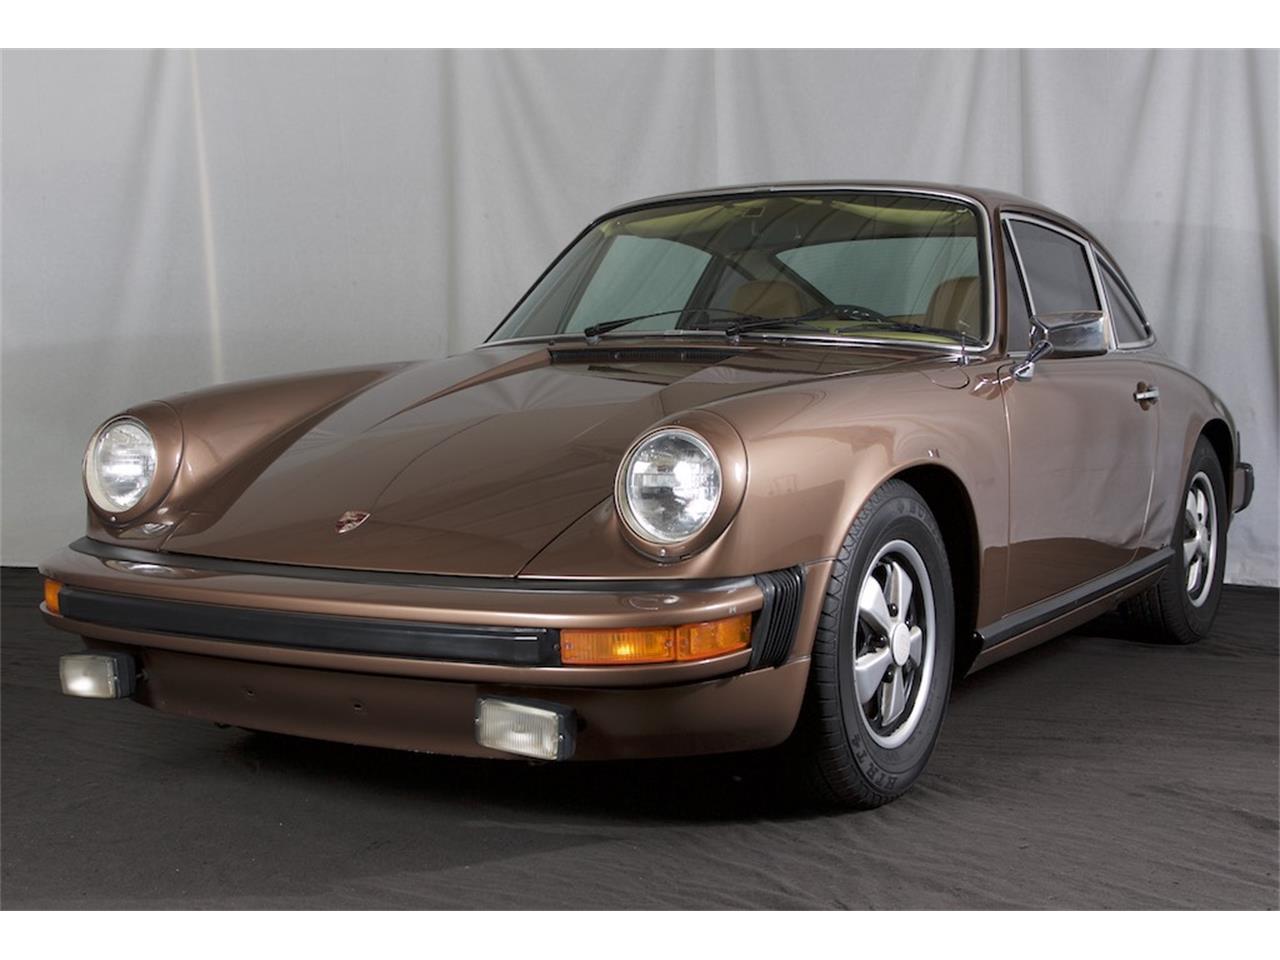 1976 Porsche 912 for Sale | ClassicCars.com | CC-1057576Classic Cars